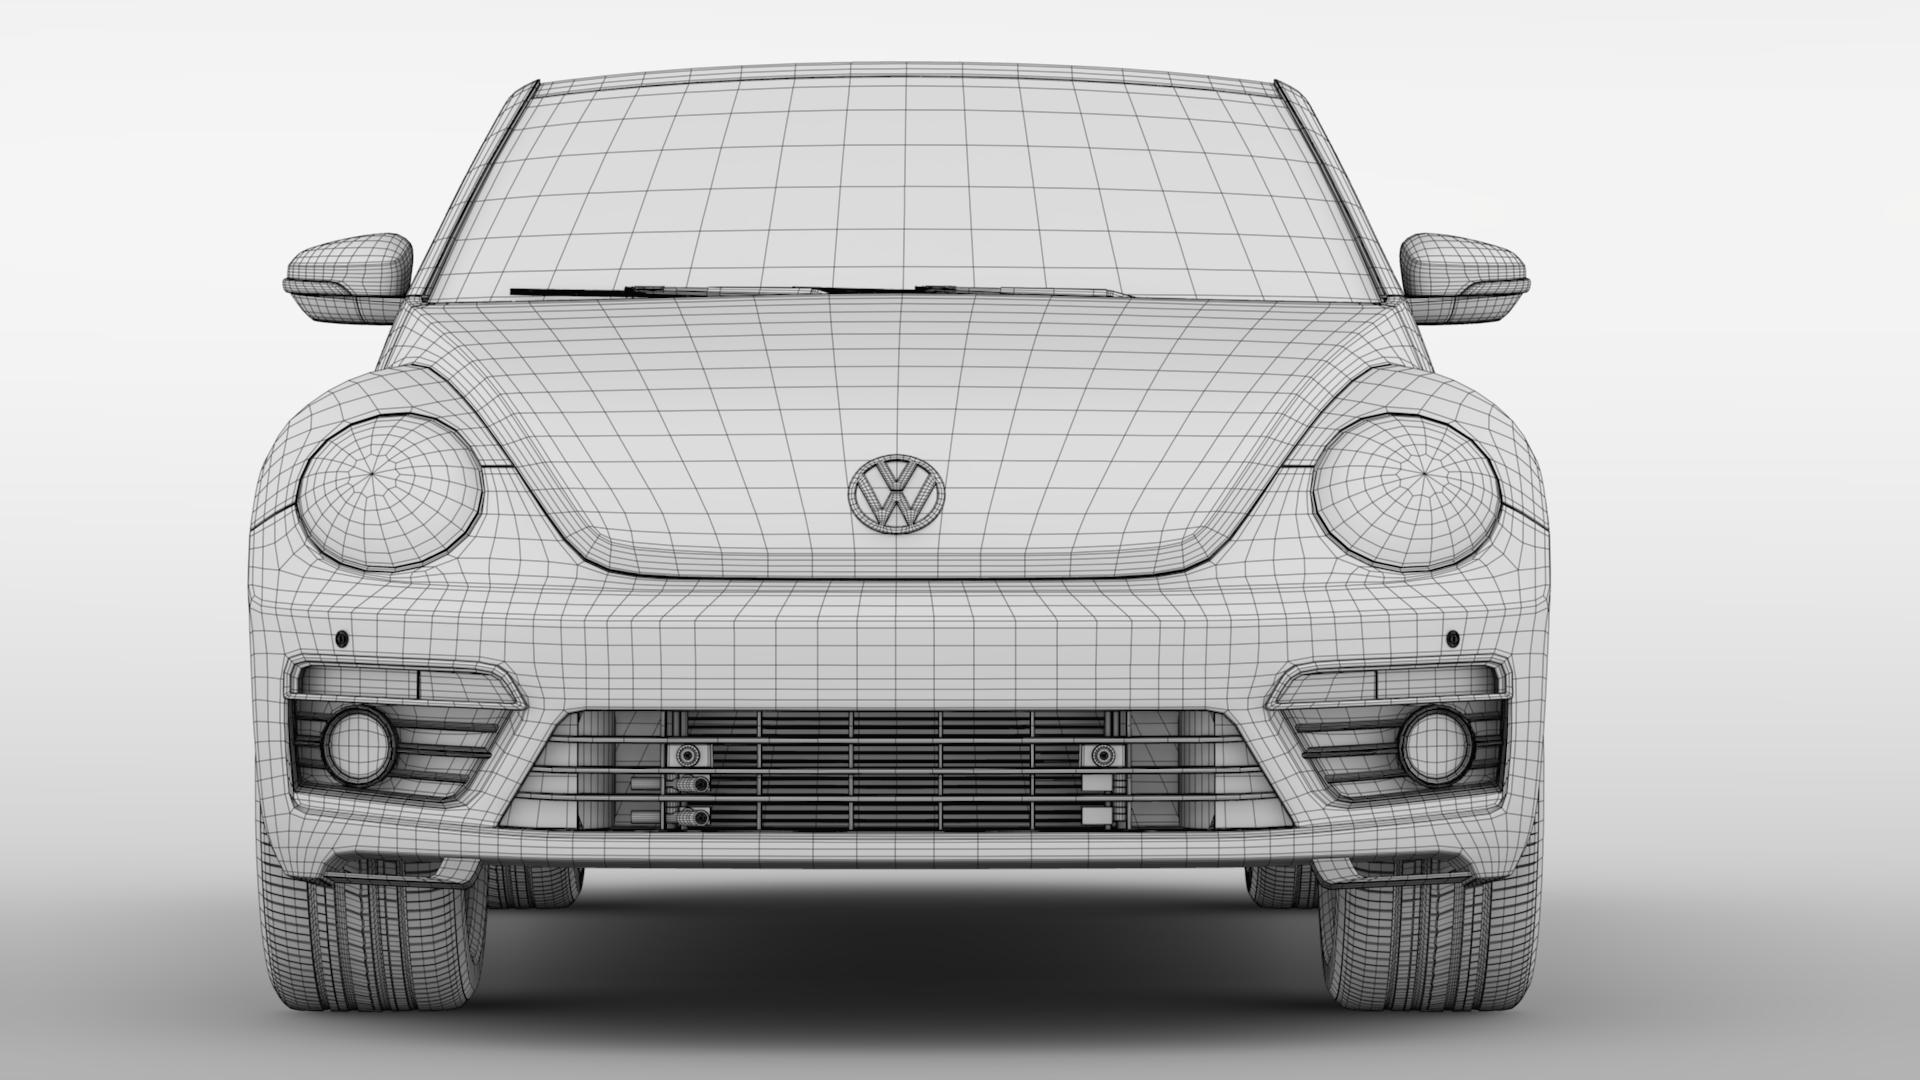 vw beetle cabriolet 2017 3d model 3ds max fbx c4d lwo ma mb hrc xsi obj 221607